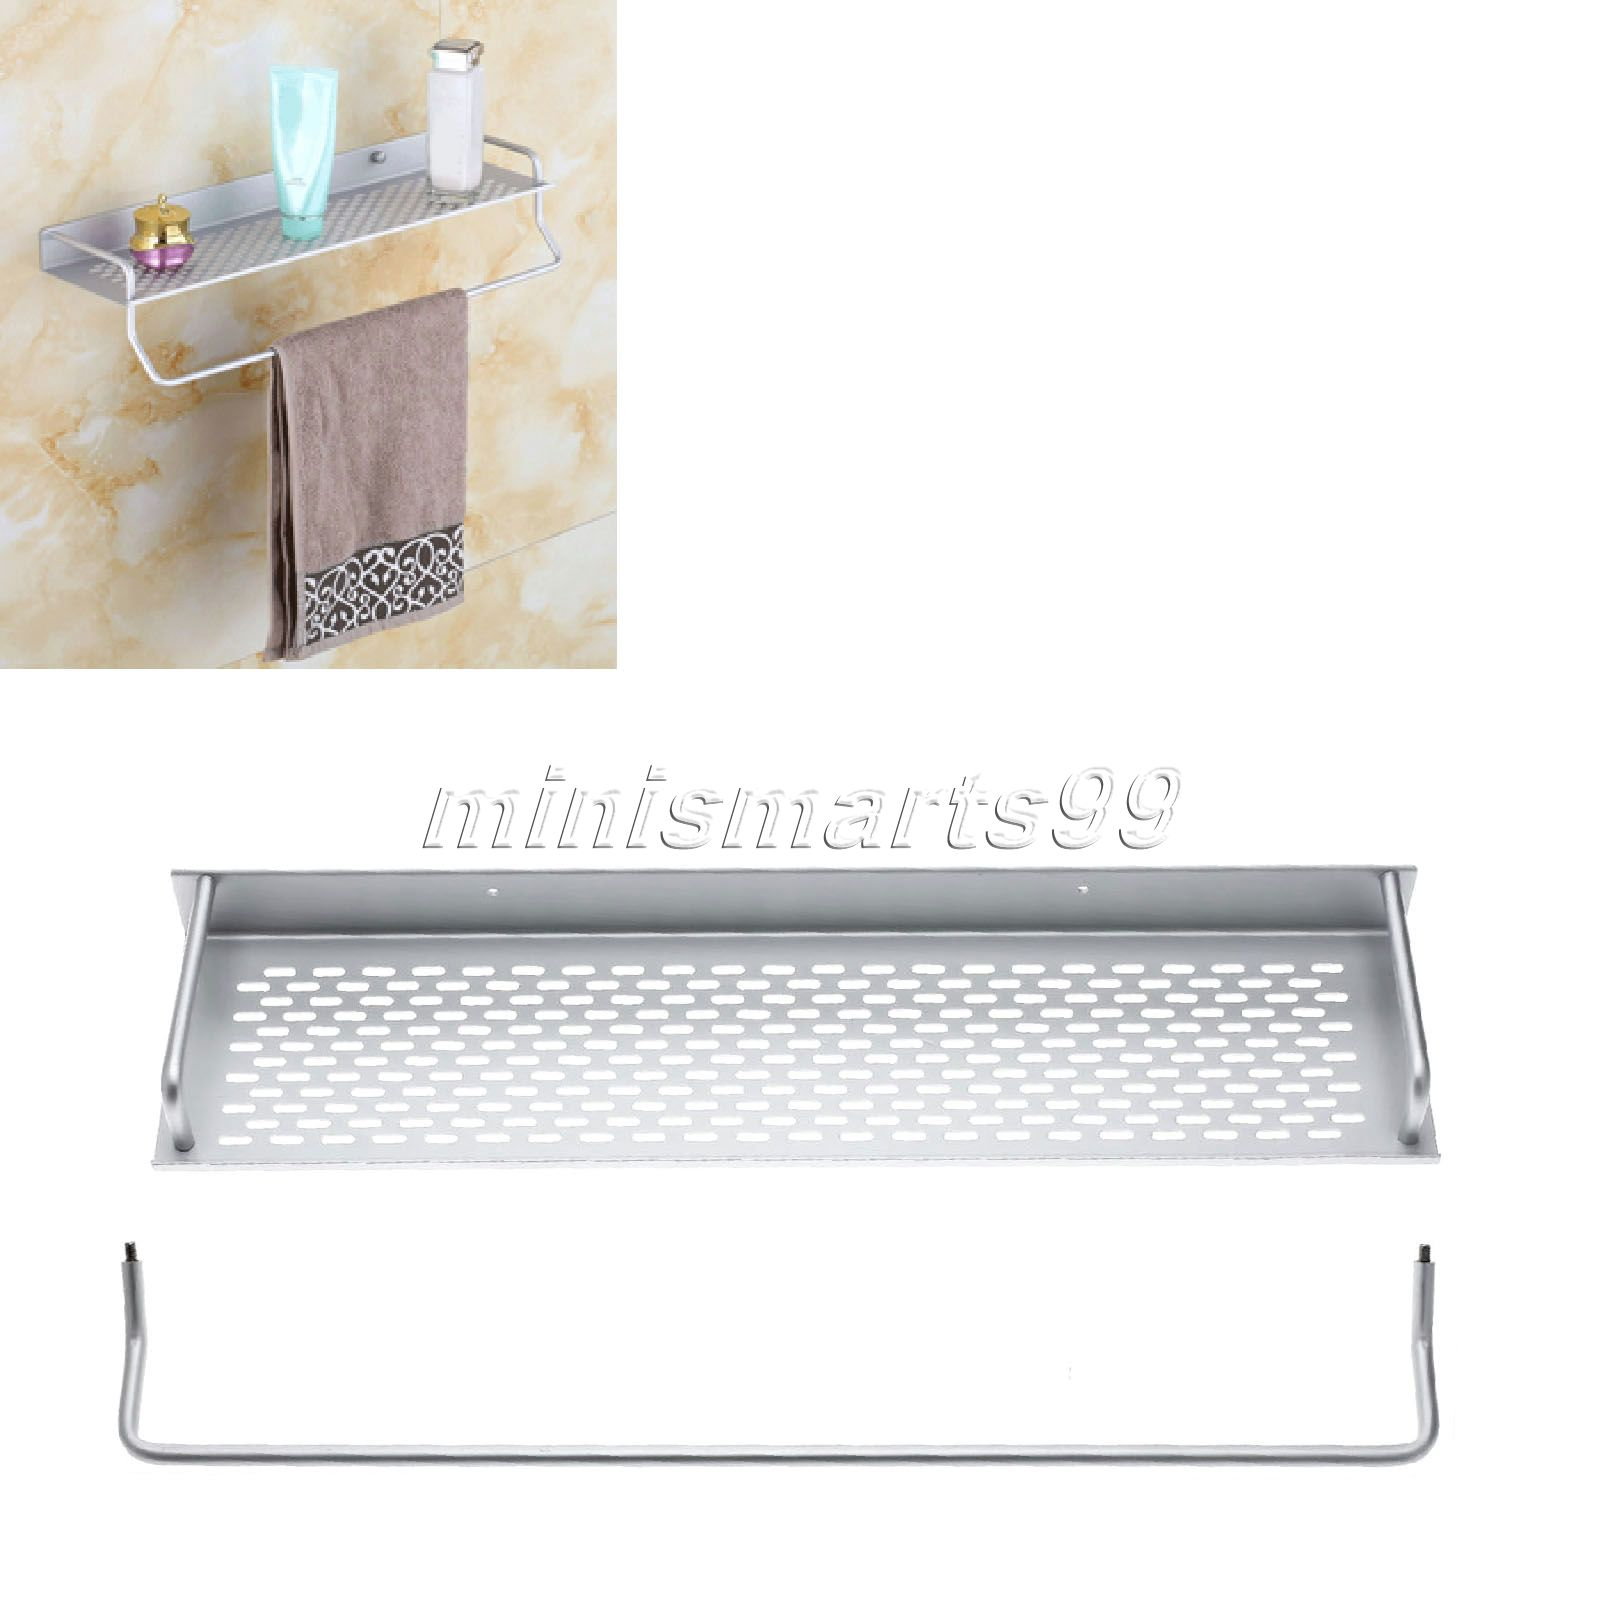 Aluminium Bathroom Shelves Bath Rack Holder Wtowel Bar Rack Wall